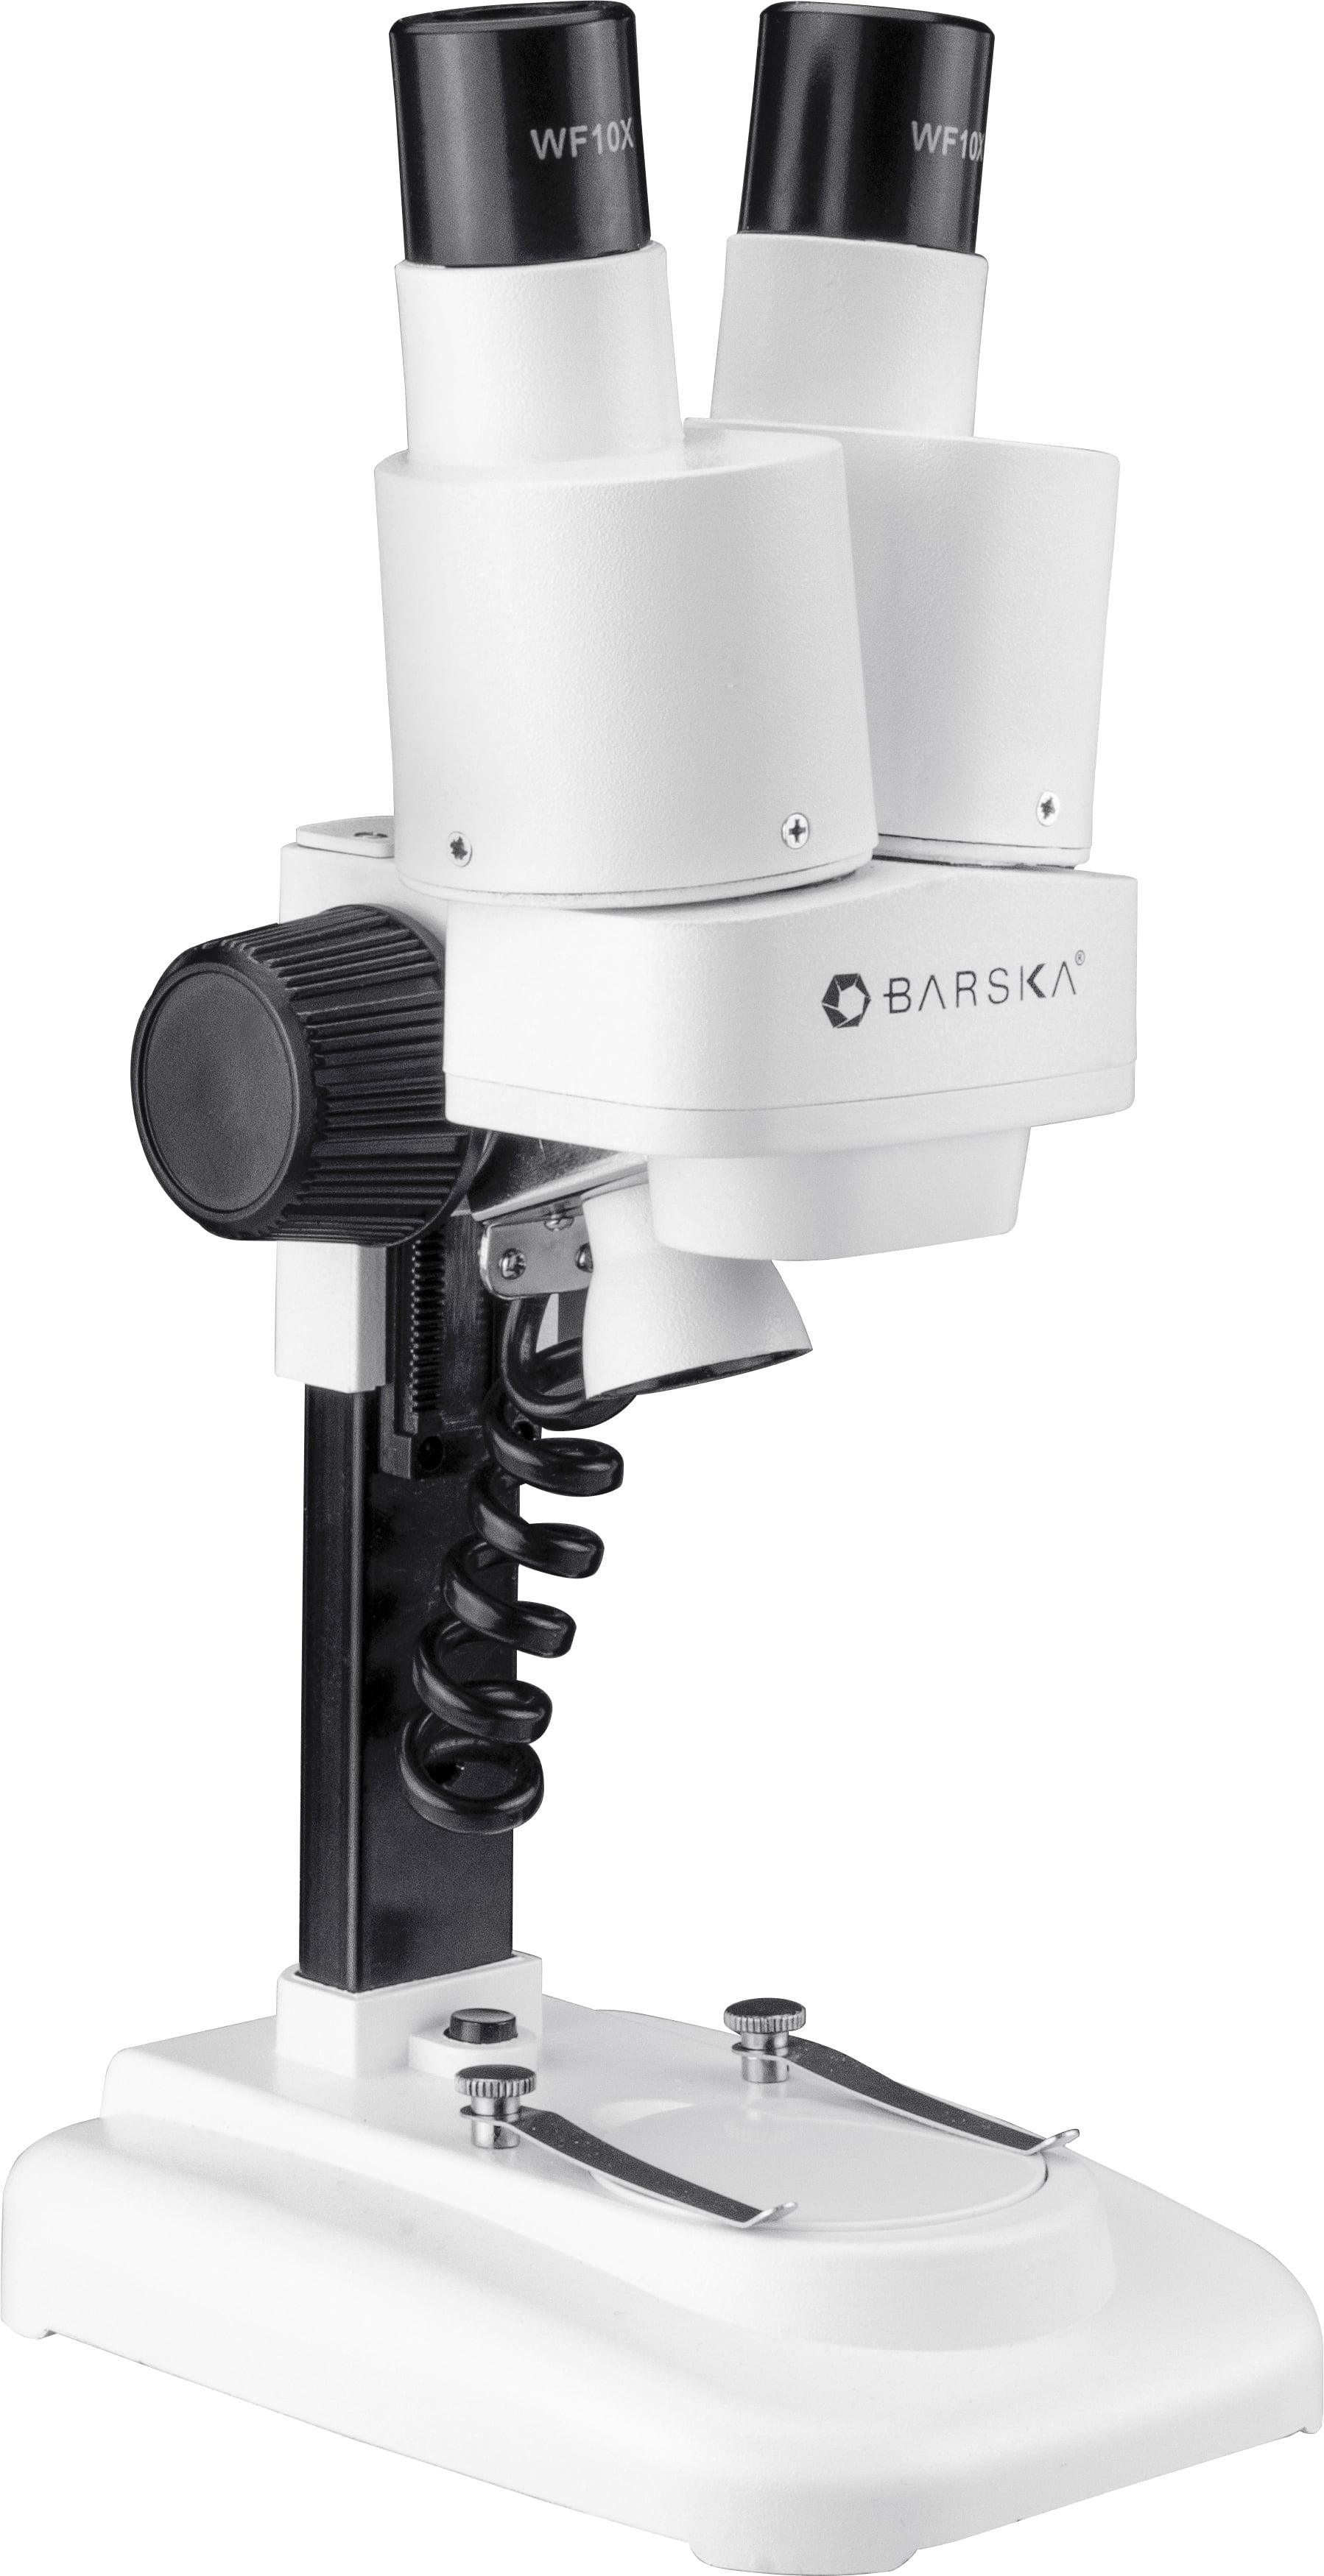 20X, 50X Student Stereo Microscope by Barska